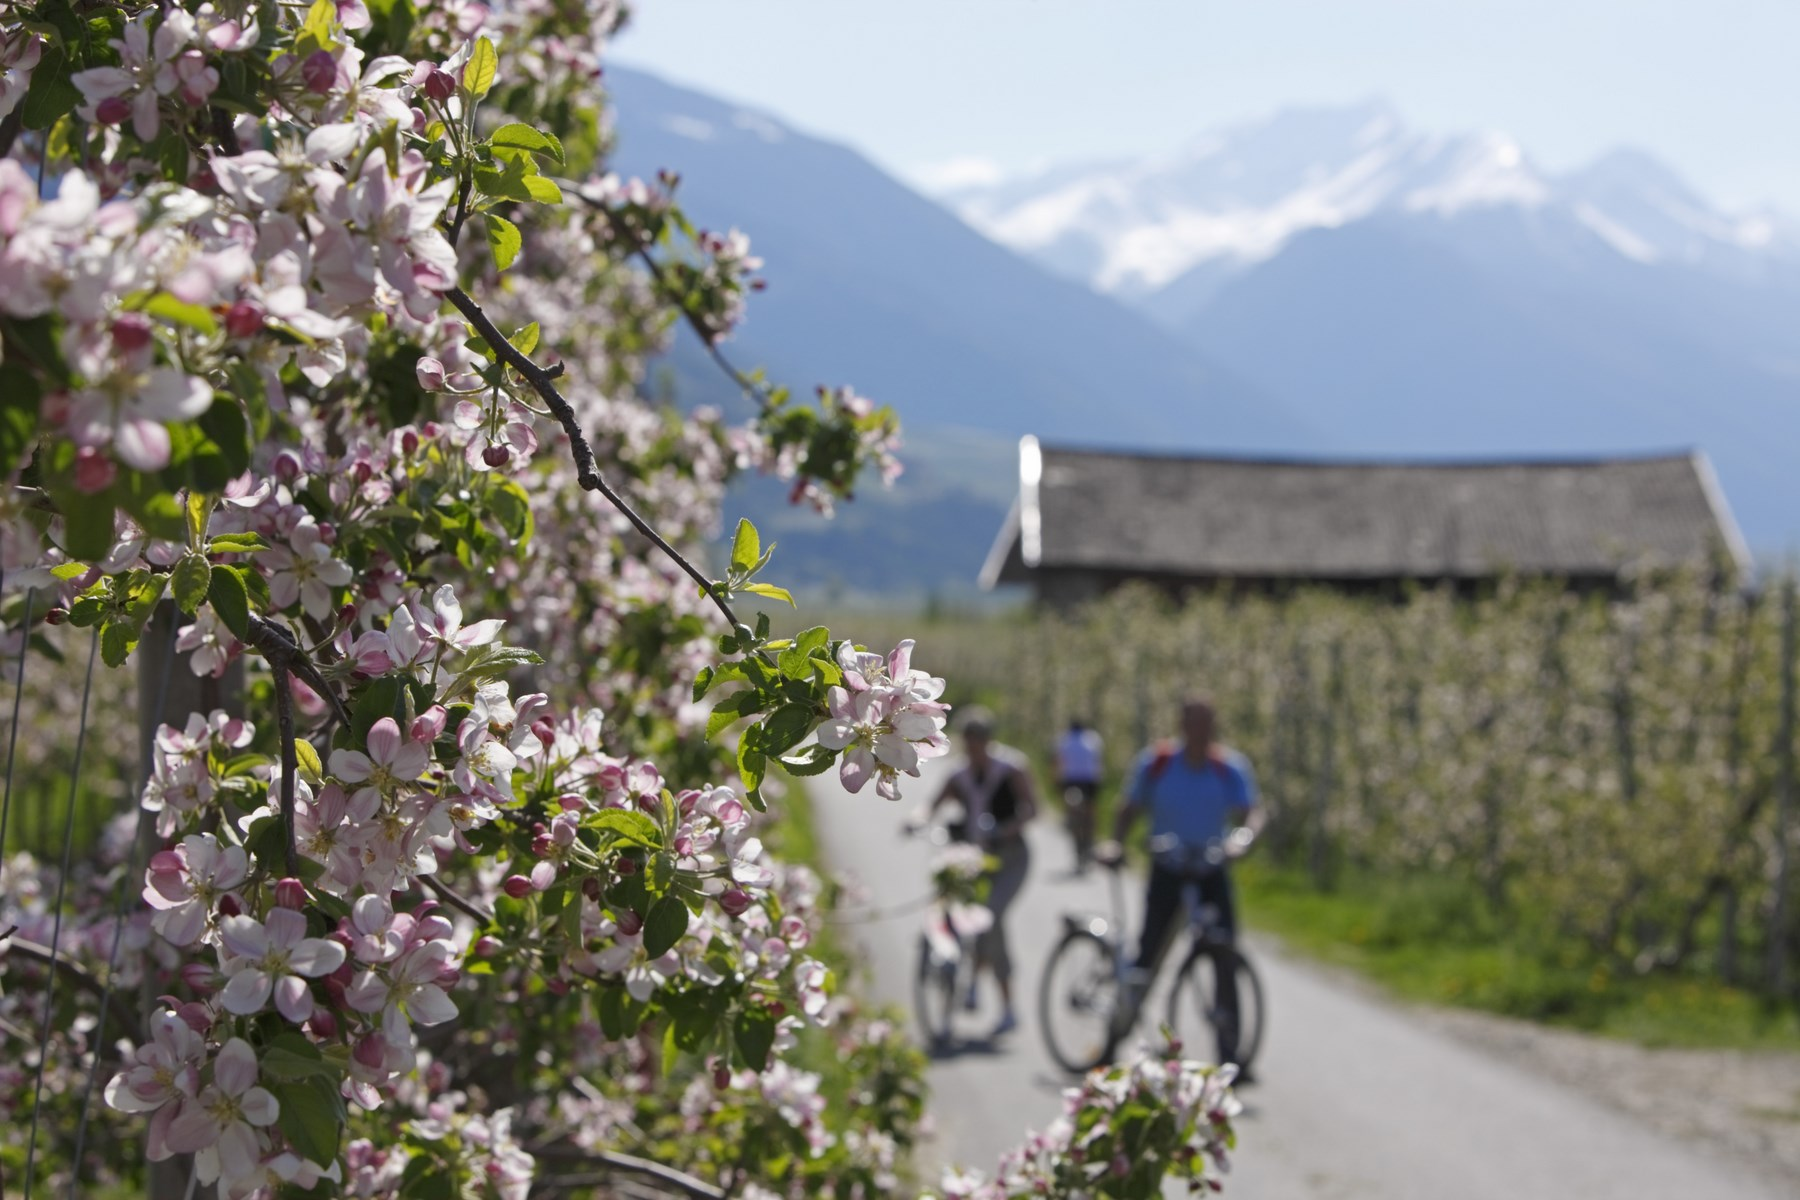 Technik-247.de - Technik Infos & Technik Tipps | Frühlings-Radtour durch blühende Apfelwiesen – Frieder Blickle - MGM